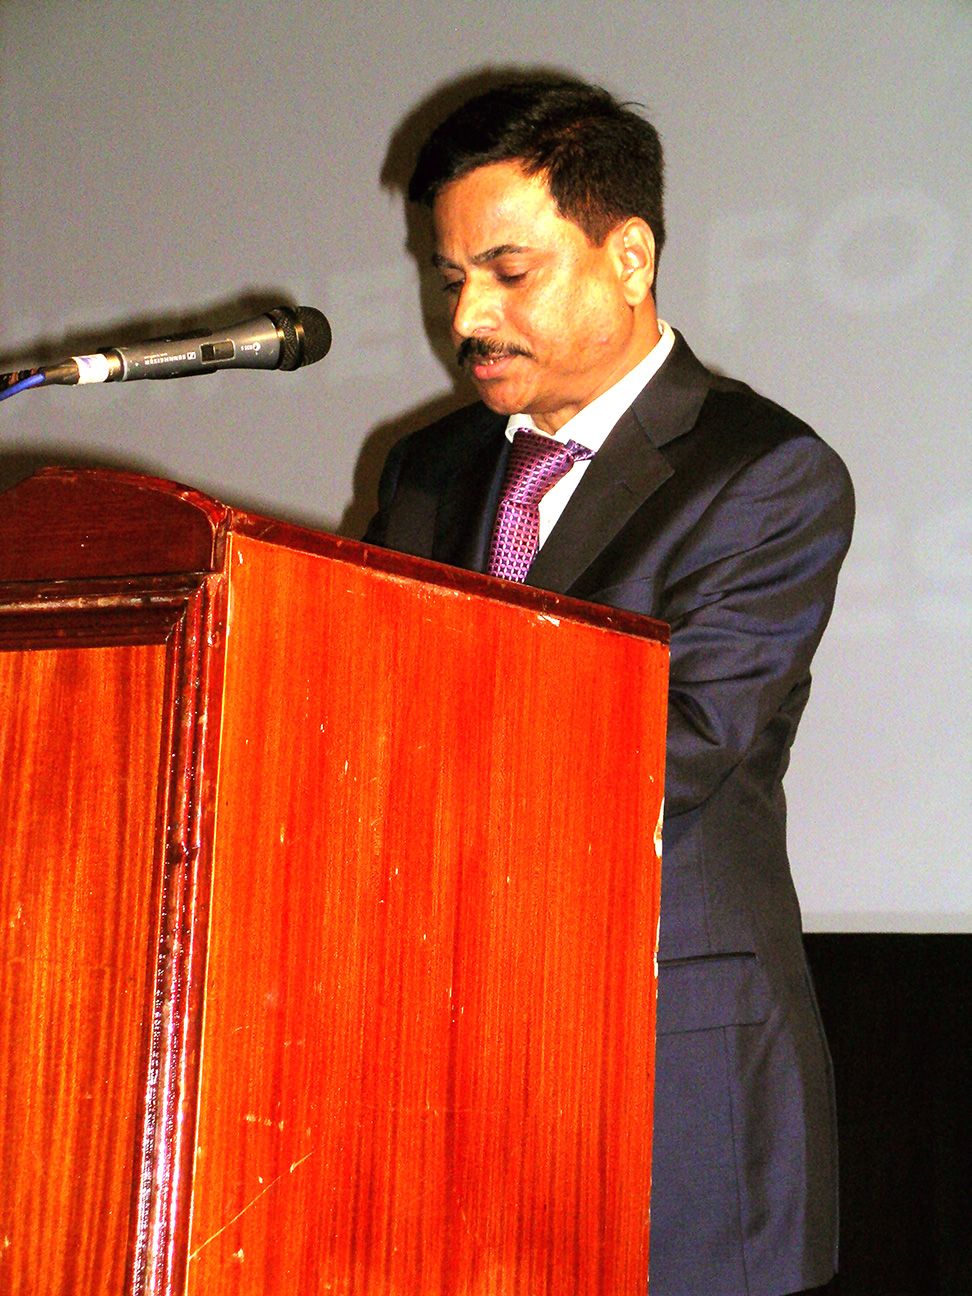 Dr. Manjrekar, SQC Chairman speaking at the function